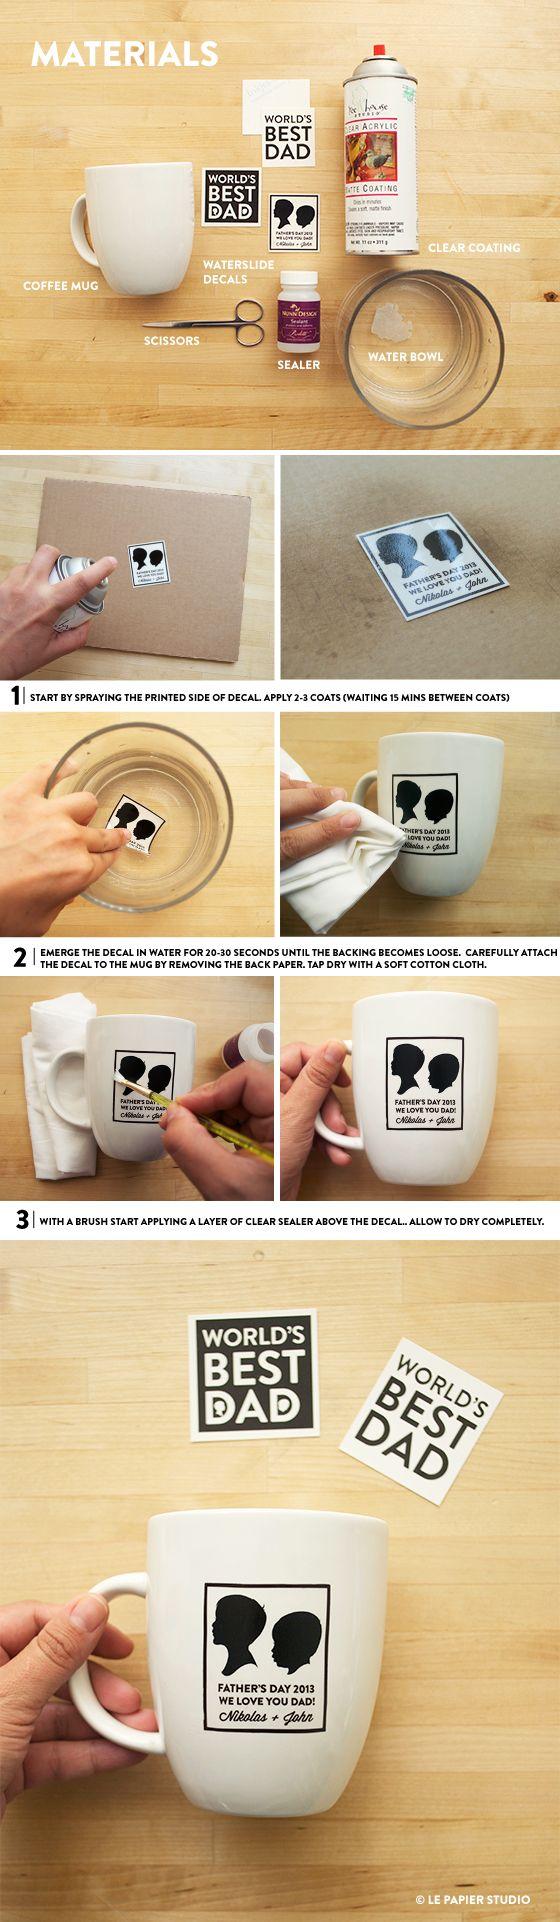 DIY Tutorial | Father's Day Silhouette Coffee Mug #lepapierstudio #giftsfordad